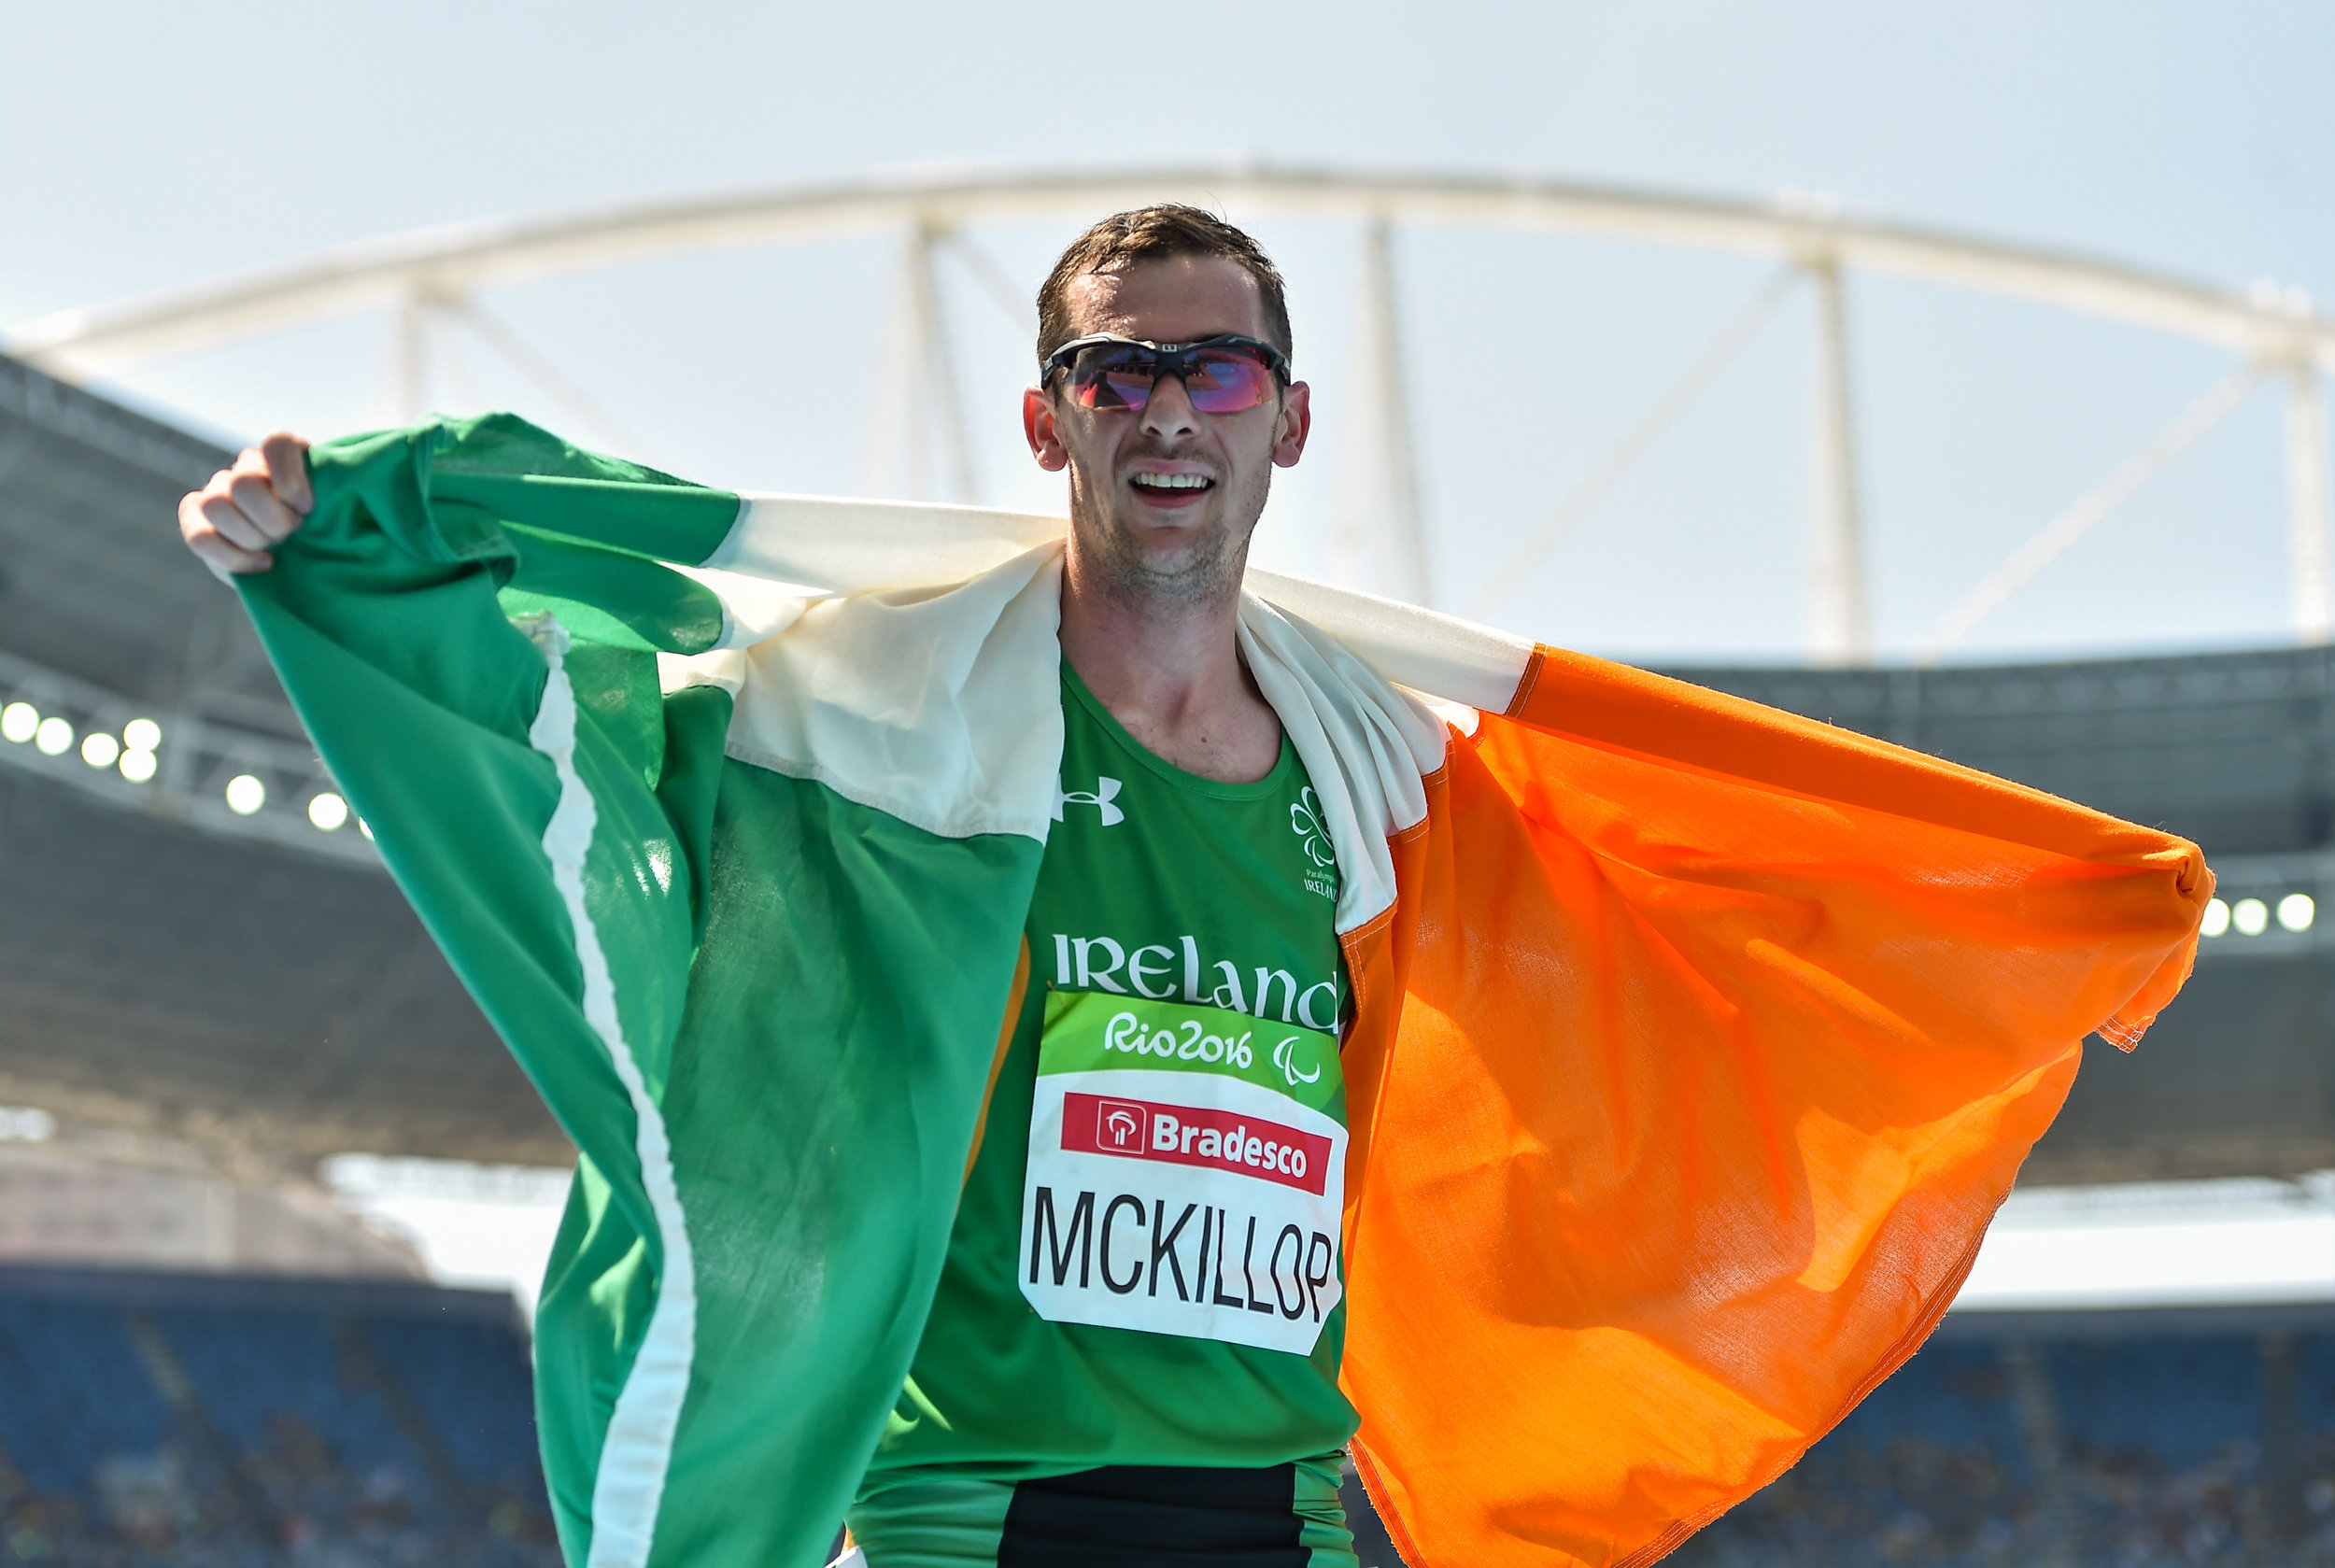 Athletics: Michael McKillop in the T37 1500m Final